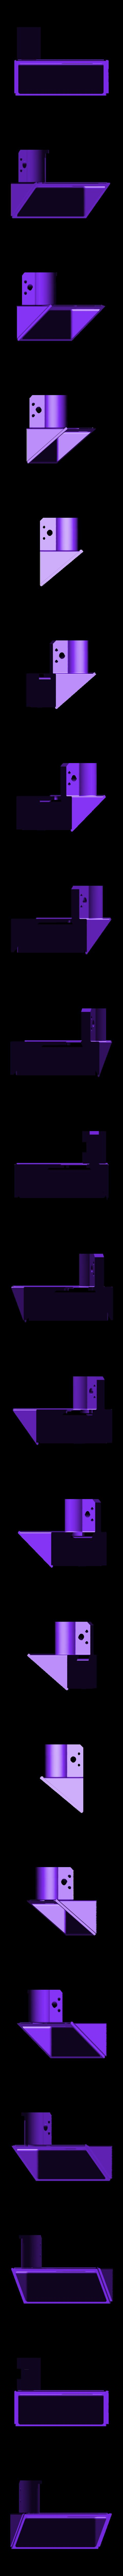 power_inlet_panel.stl Download free STL file Portable 3D Printer • 3D printable design, Job